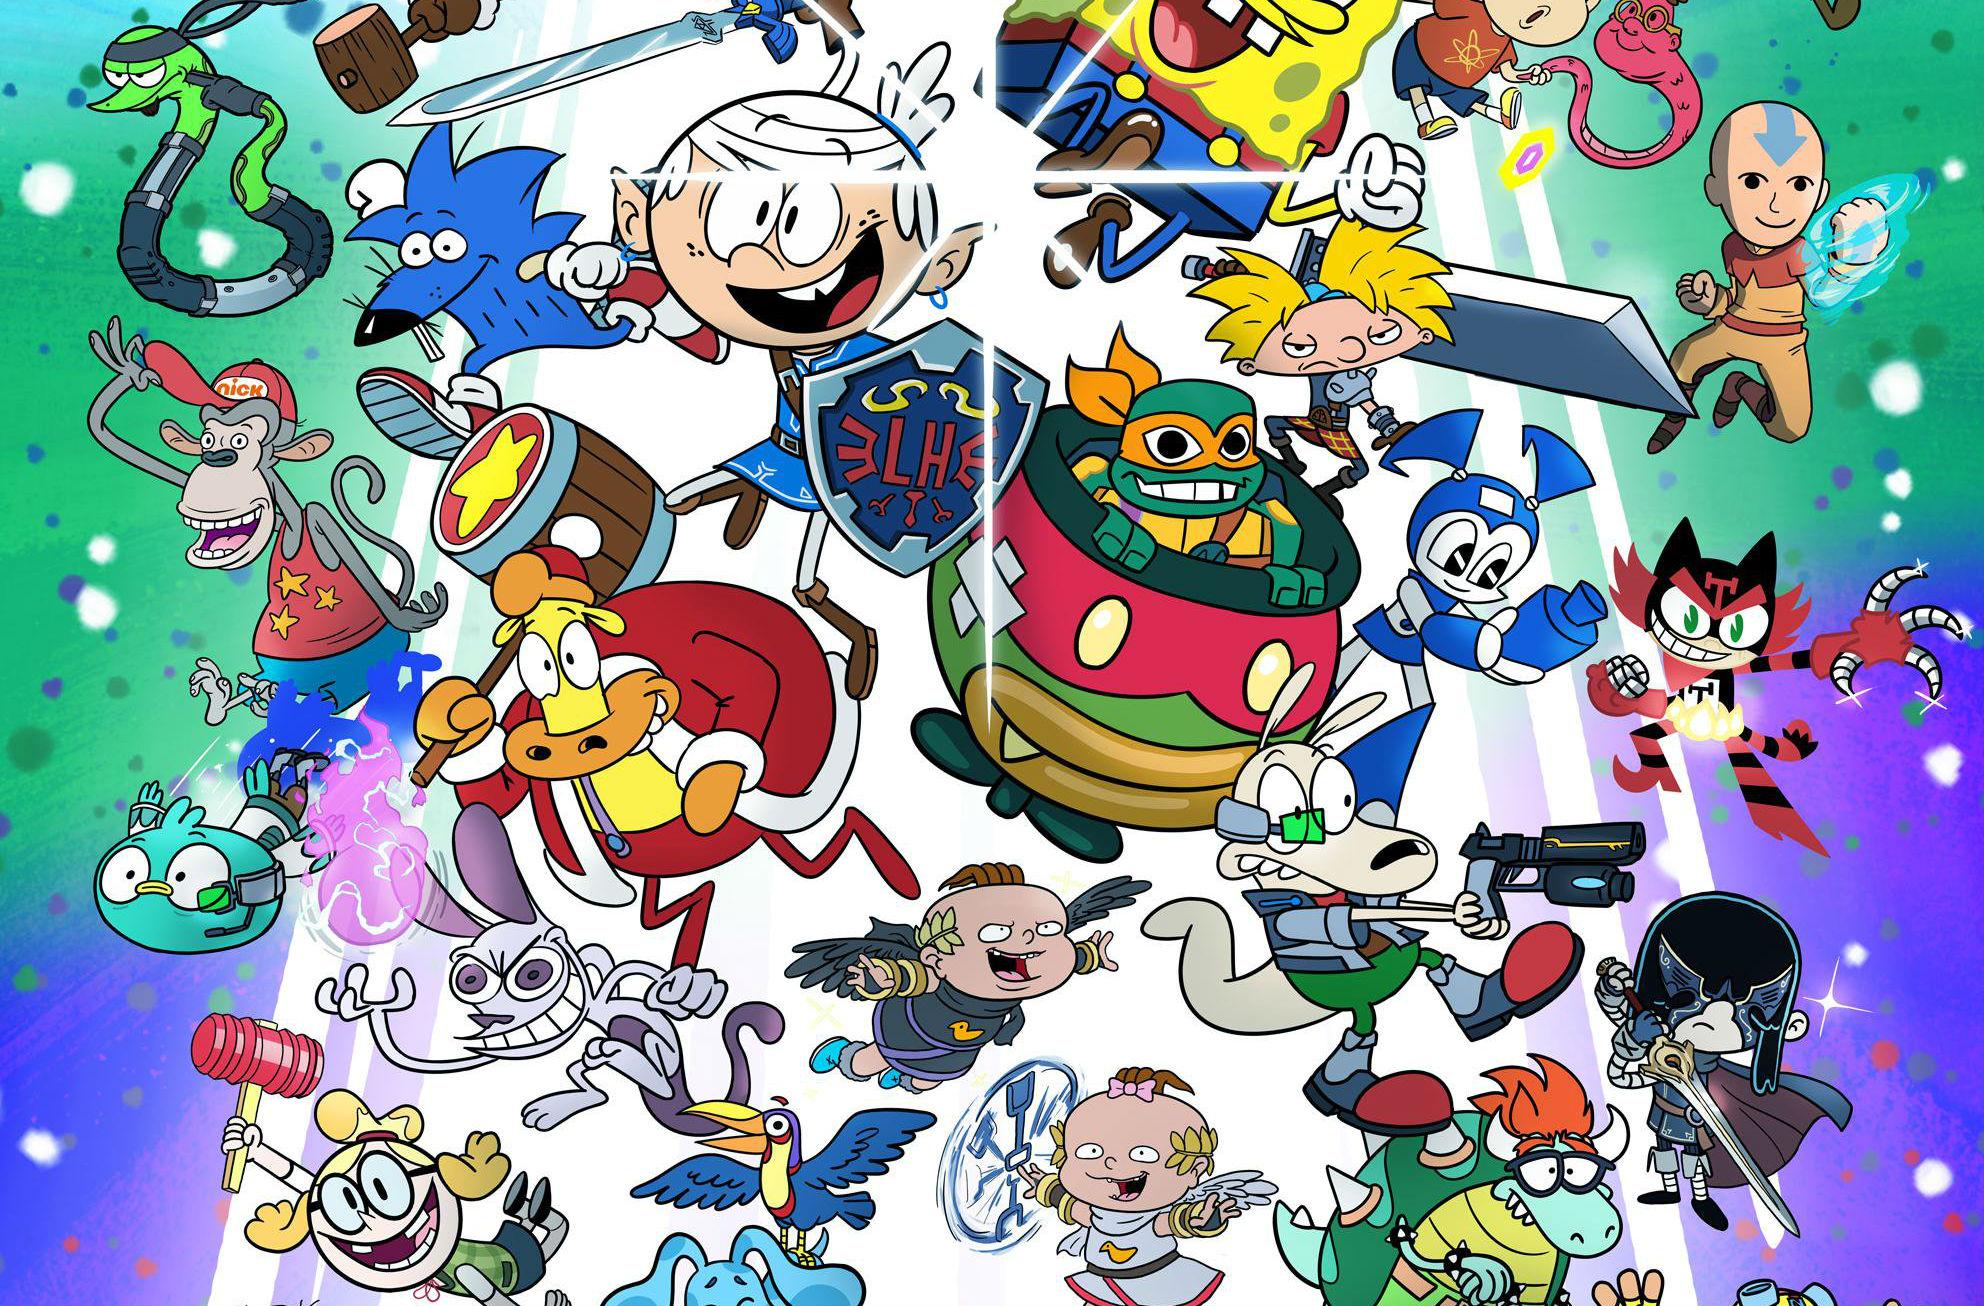 Official Nickelodeon artists made this Nick Cartoon Smash Bros. mashup poster screenshot